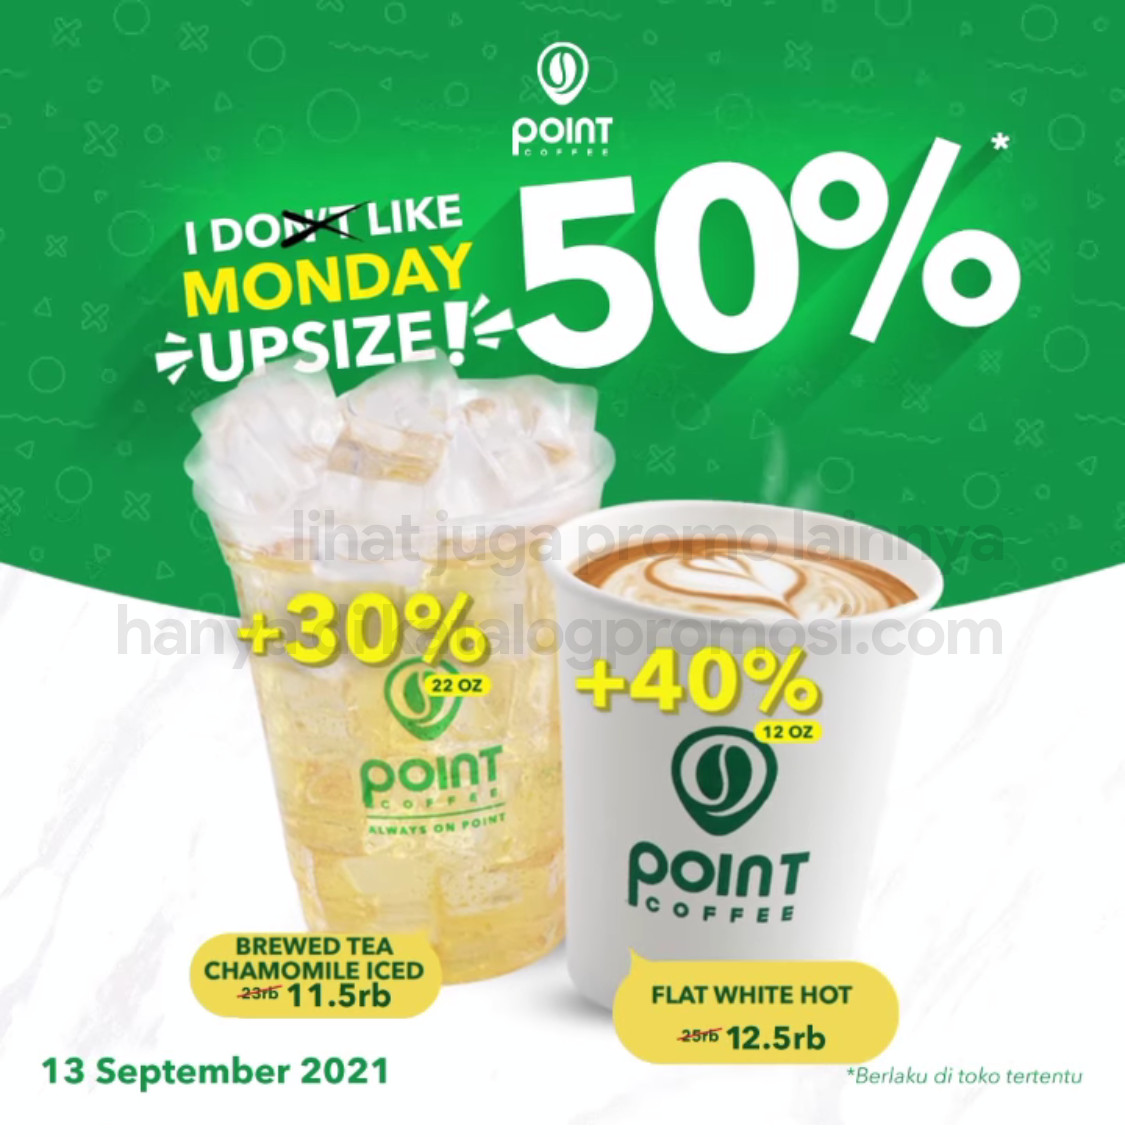 INDOMARET POINT COFFEE Promo I LIKE MONDAY - DISKON 50% untuk Upsize Minuman Pilihan BERLAKU hanya 1 hari, tanggal 13 September 2021